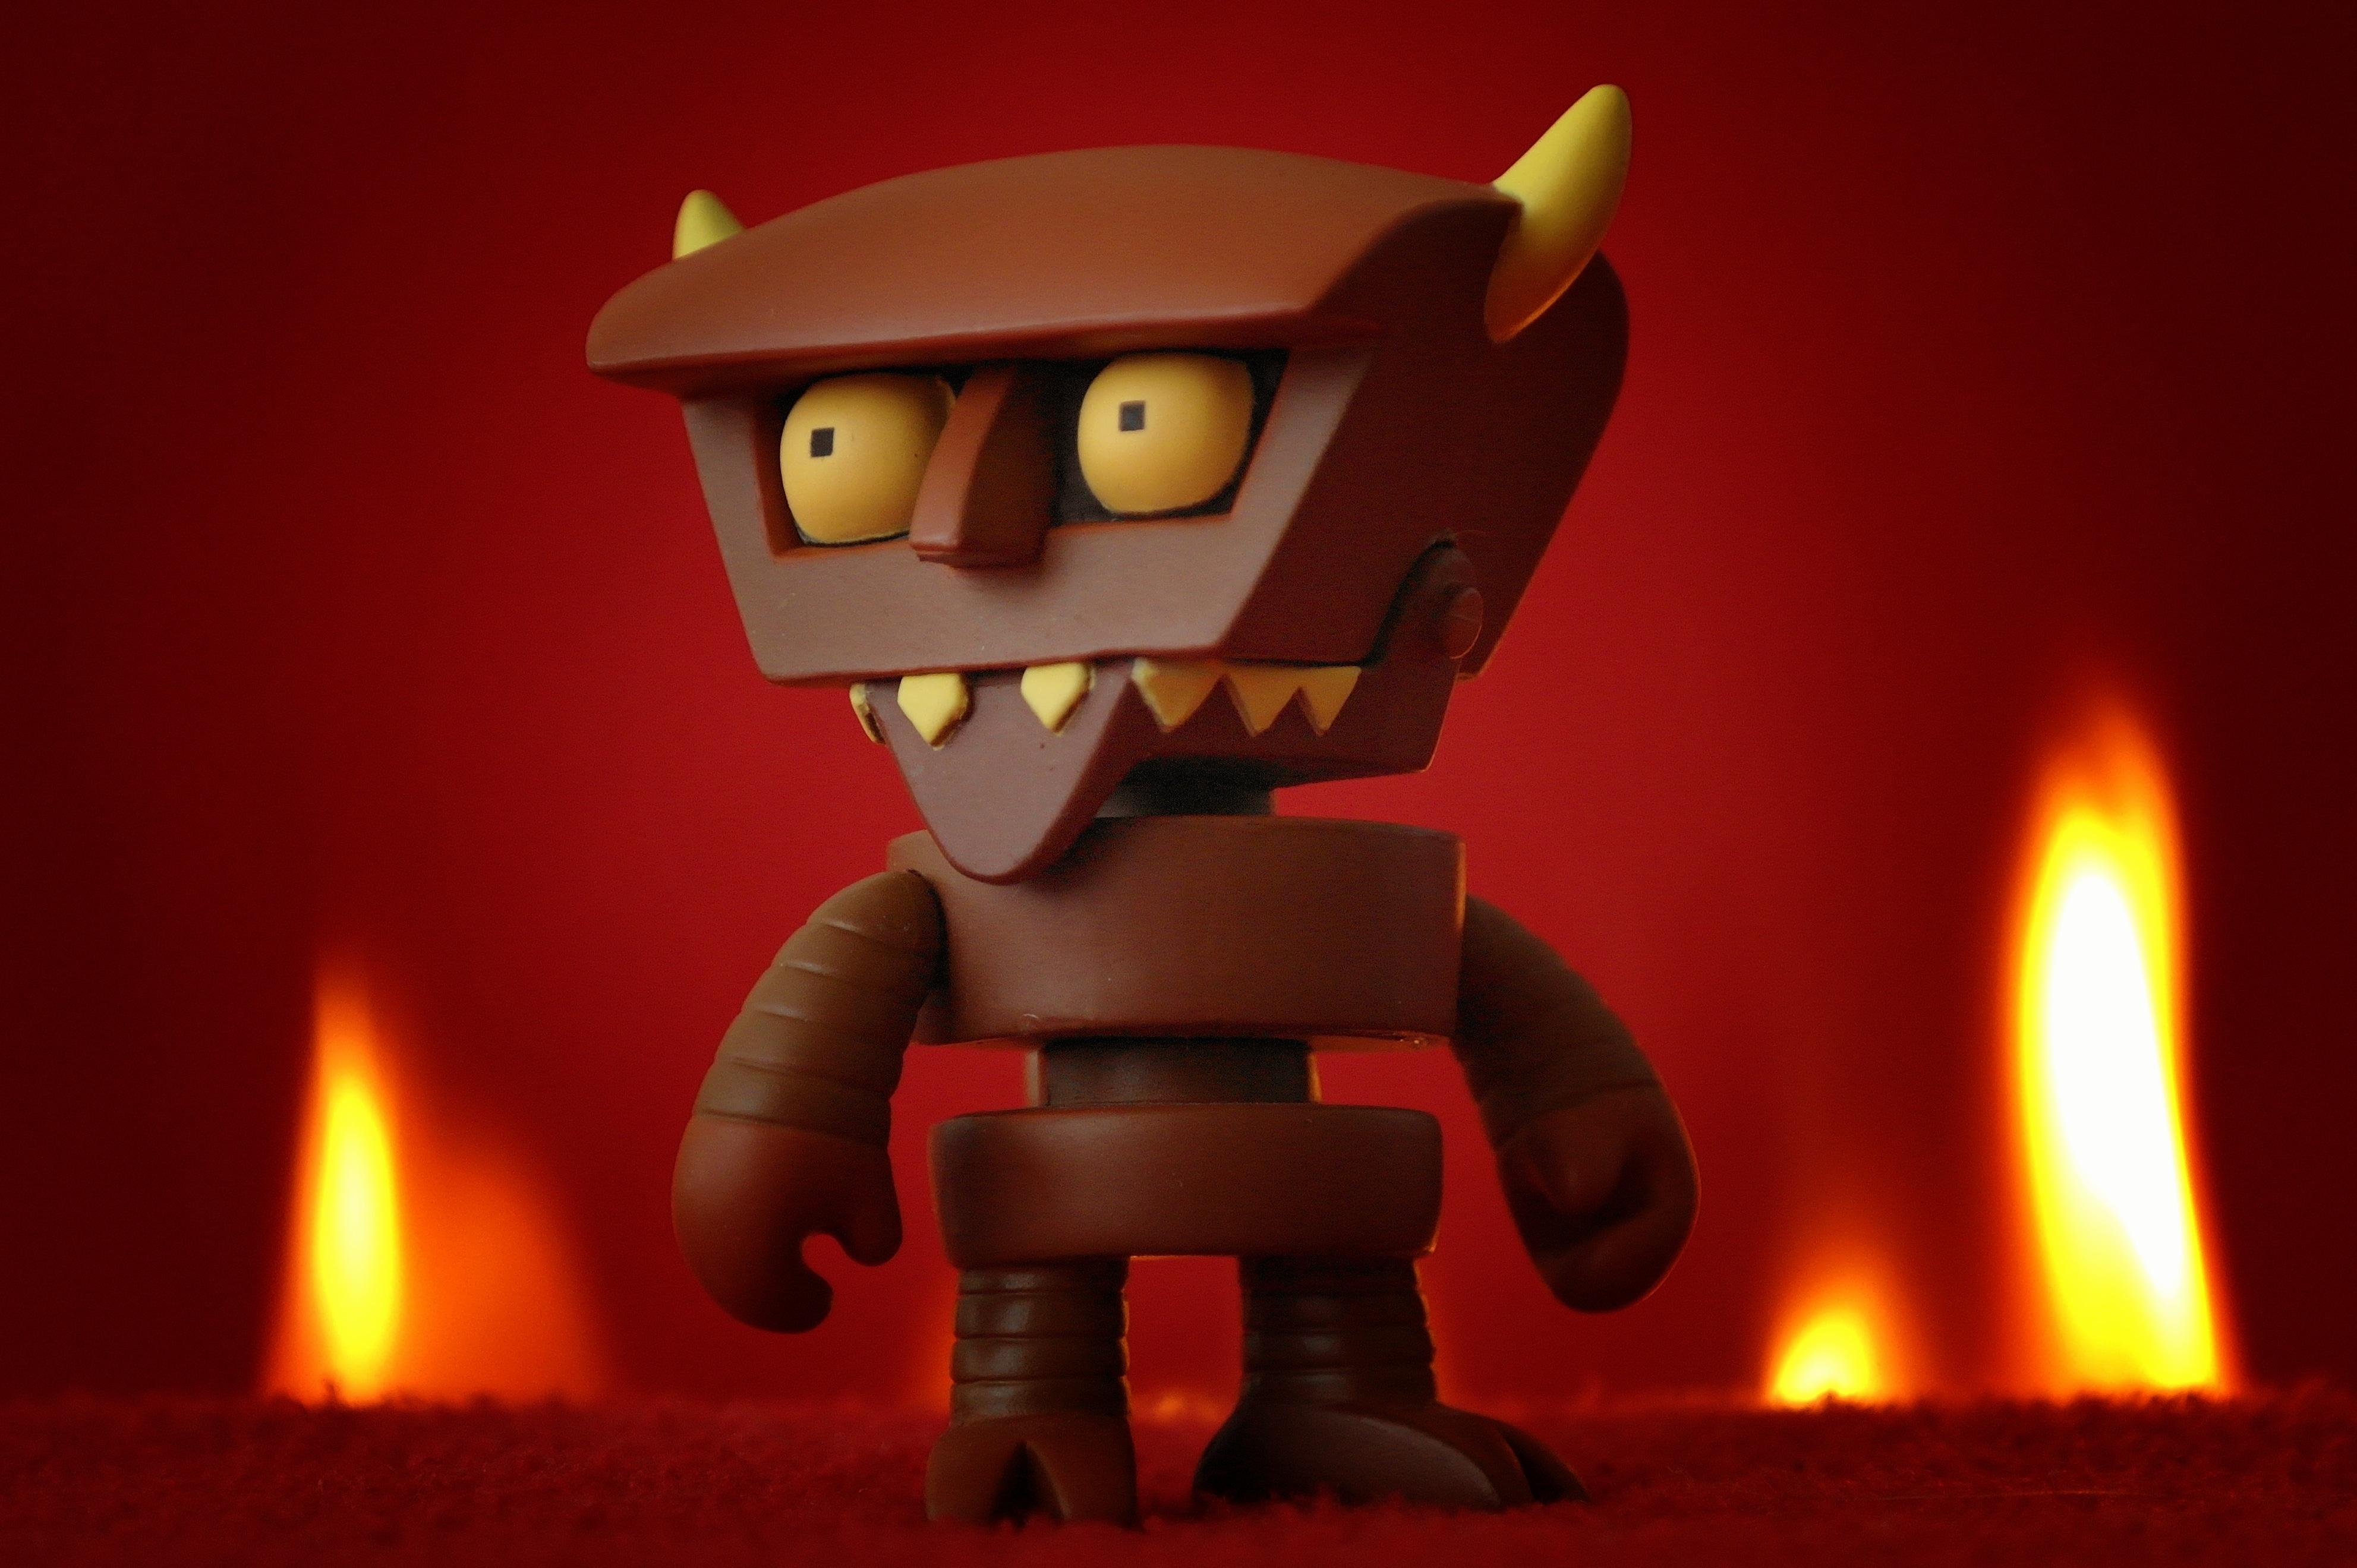 Courtesy by Flickr, Pugh Pugh, Robot Devil, Creative Commons 2.0